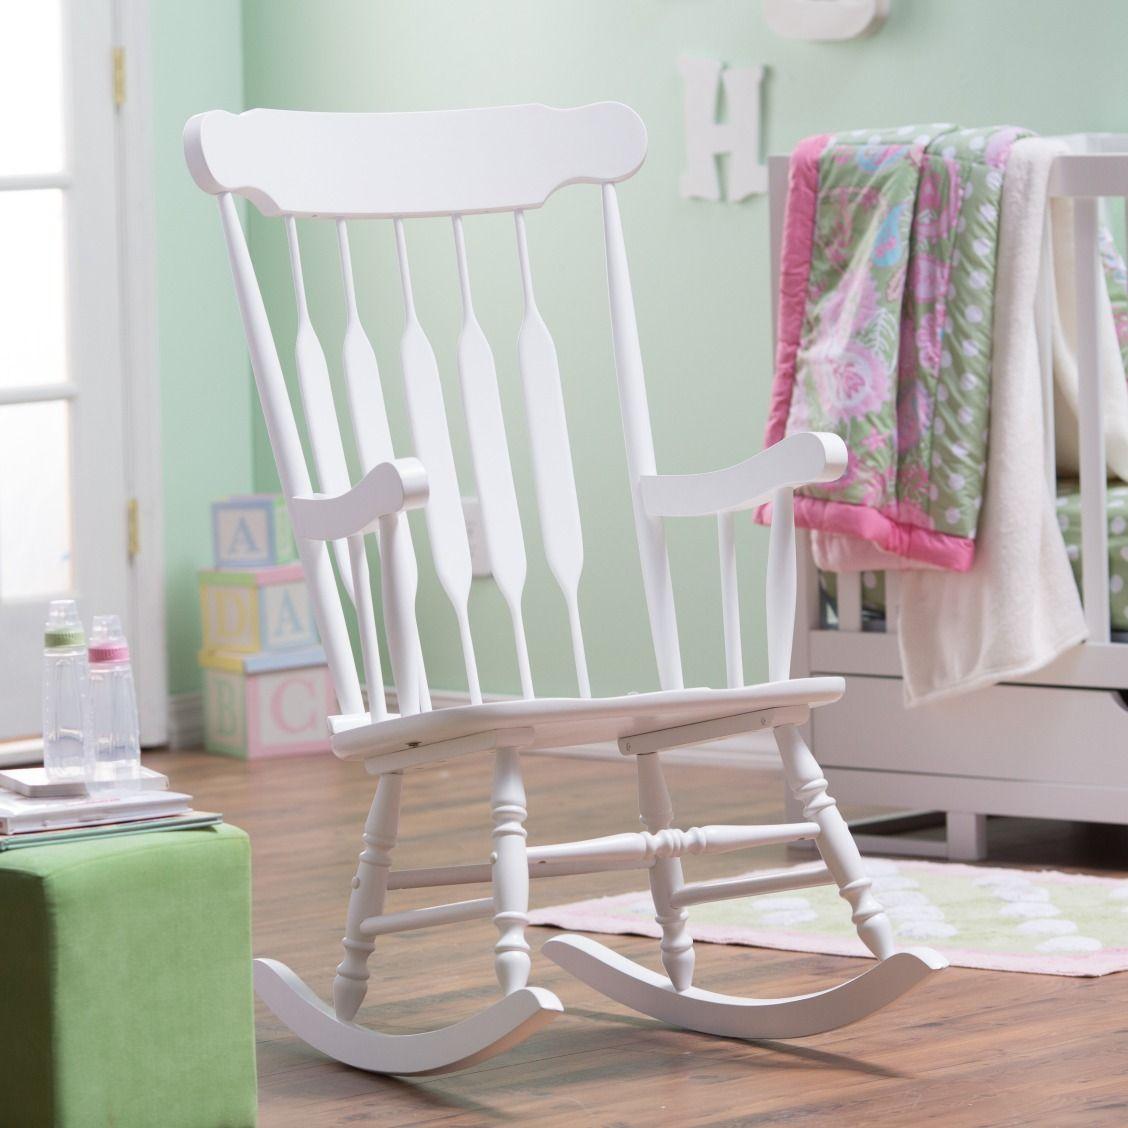 Belham Living Wood Nursery Rocker White Rocking chair